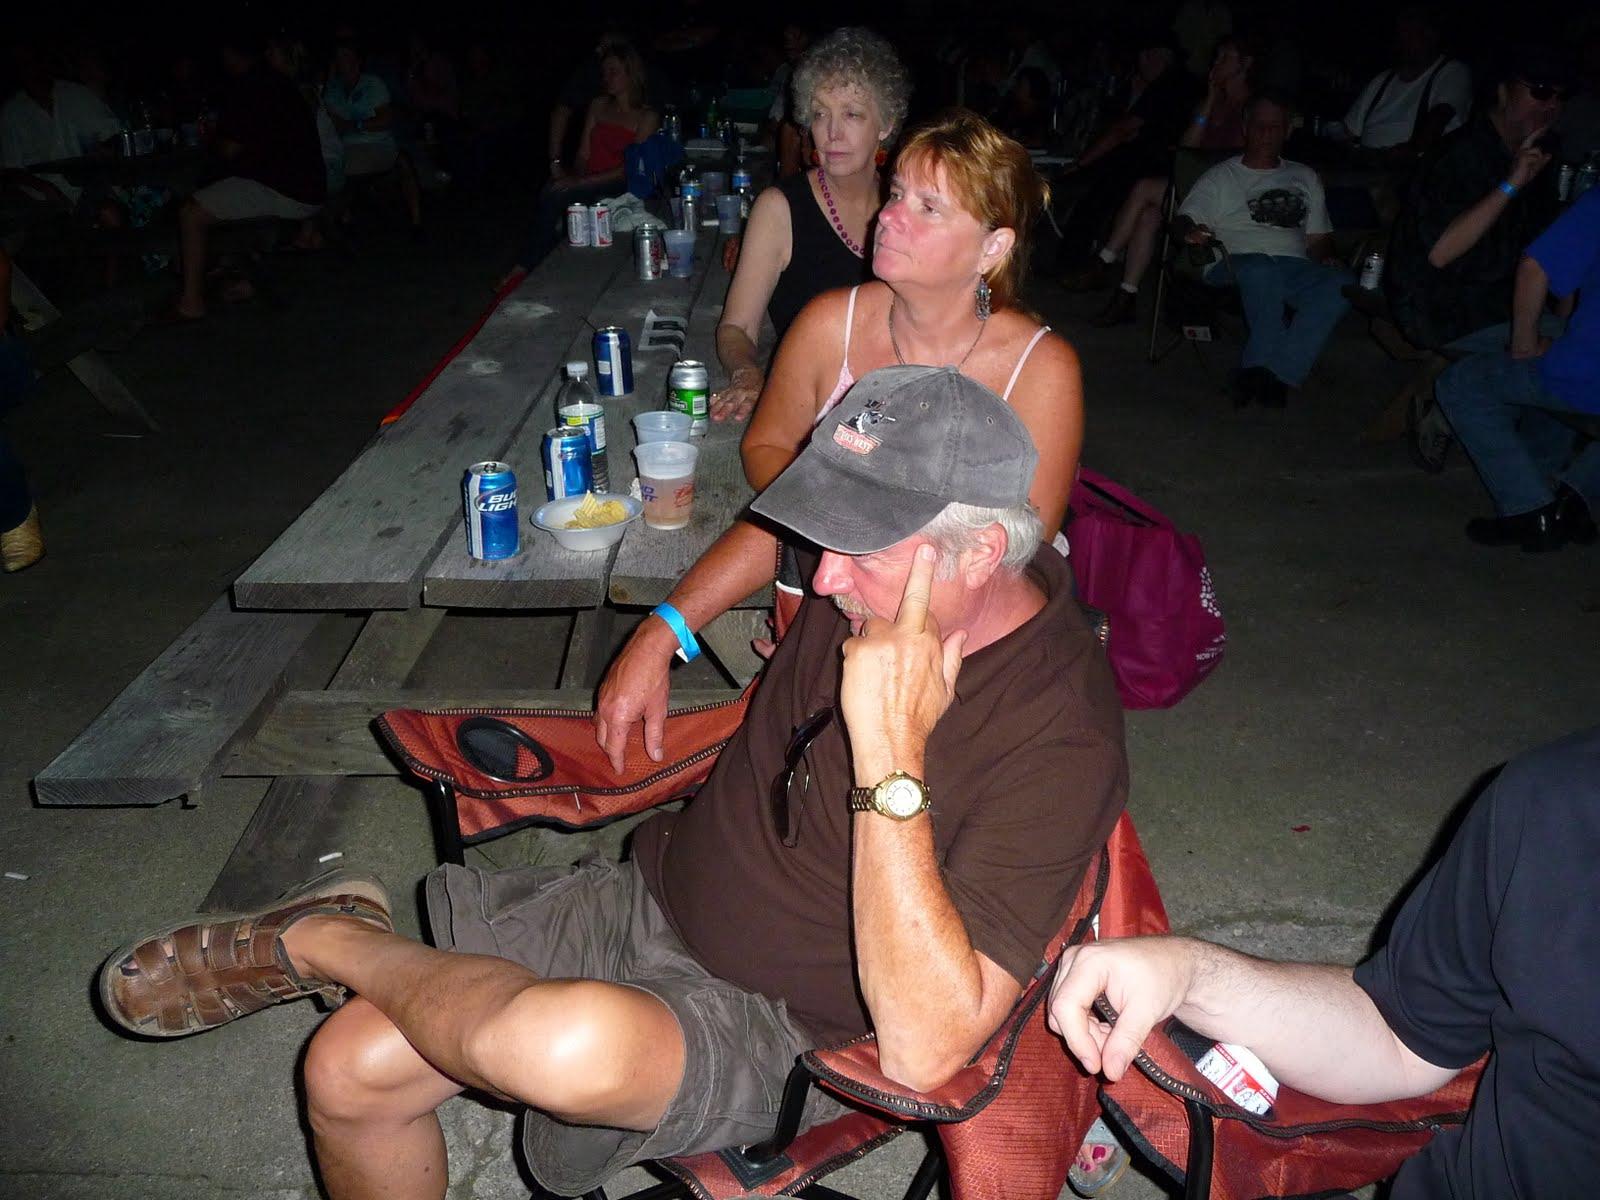 Amateur wife showing friend